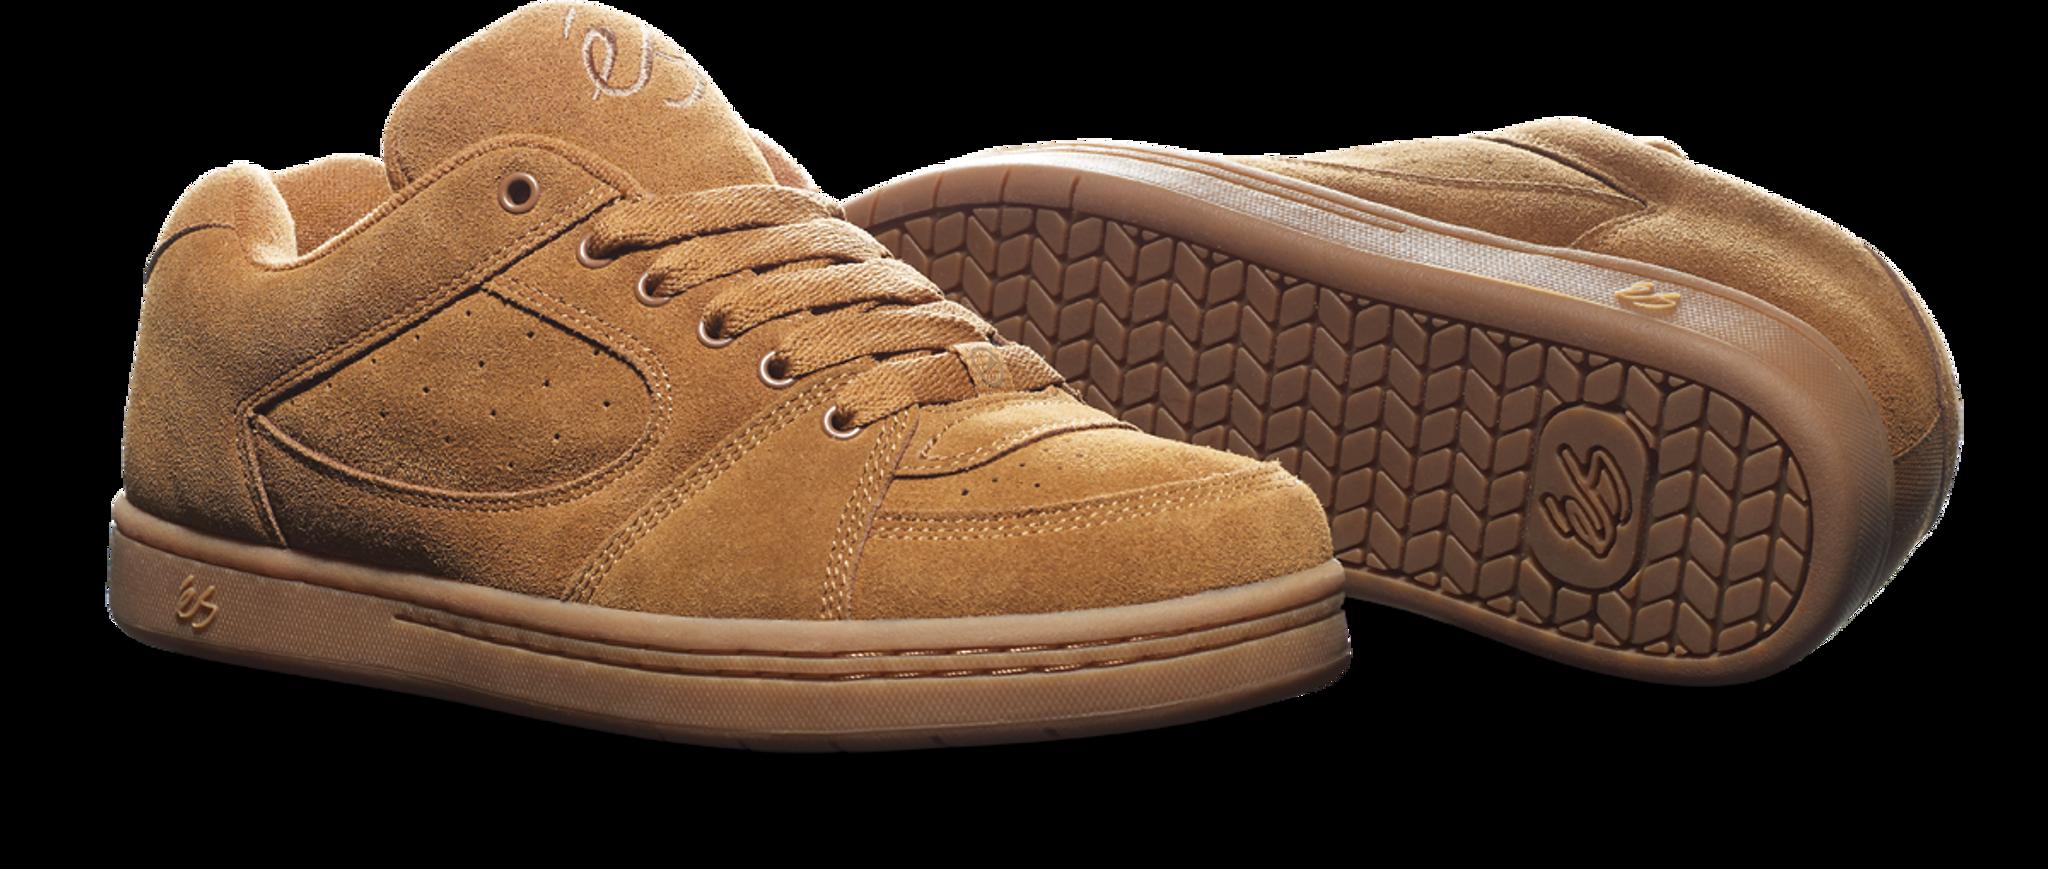 6fb1e06f1ad5 eS ACCEL OG SHOES Skate Sneakers Brown Gum 5101000139 212